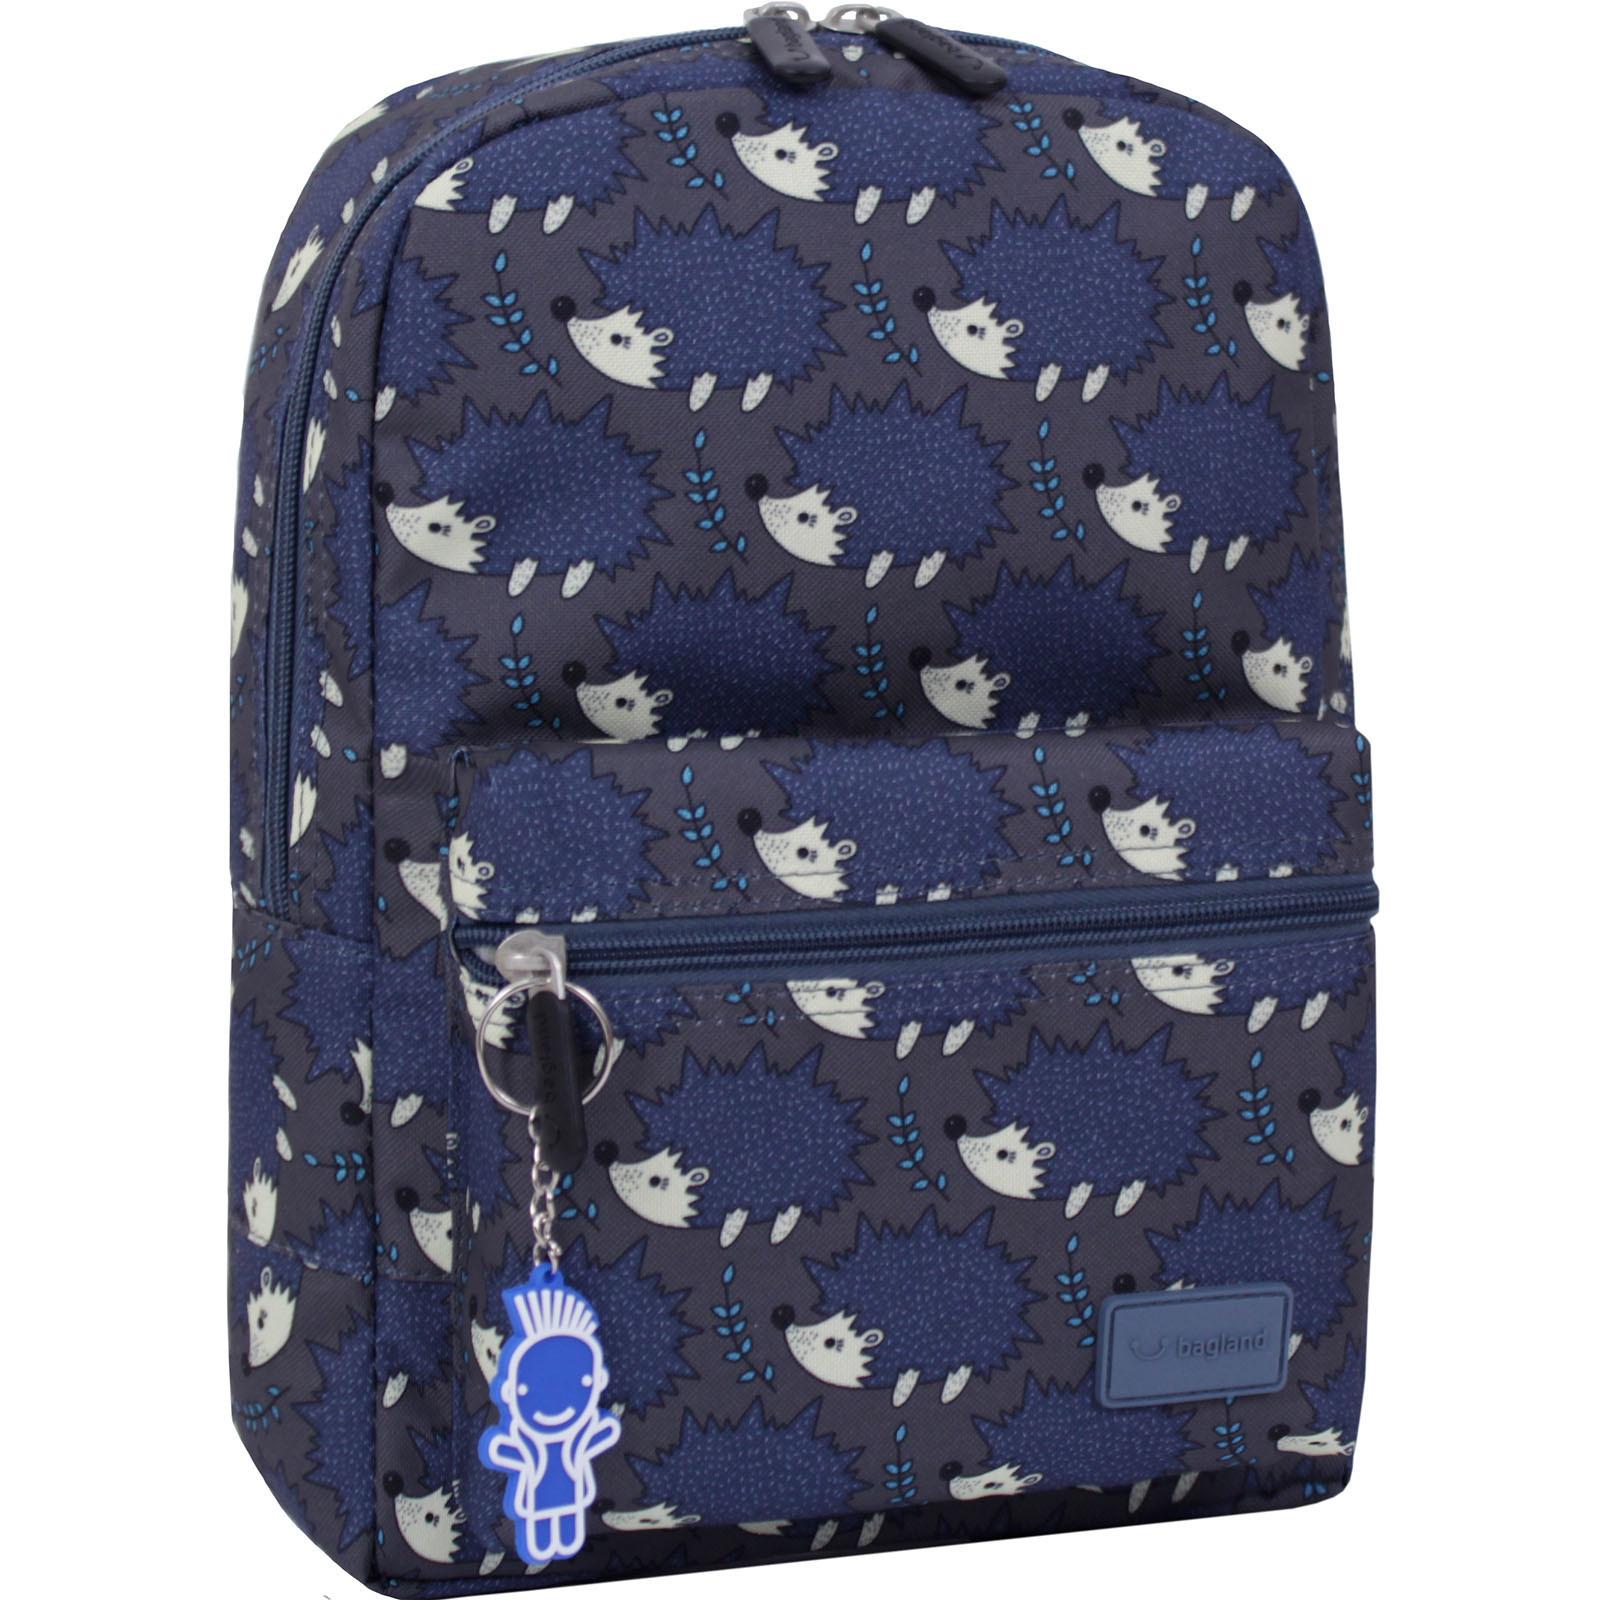 Молодежные рюкзаки Рюкзак Bagland Молодежный mini 8 л. сублимация 481 (00508664) IMG_3747_суб.481_.JPG